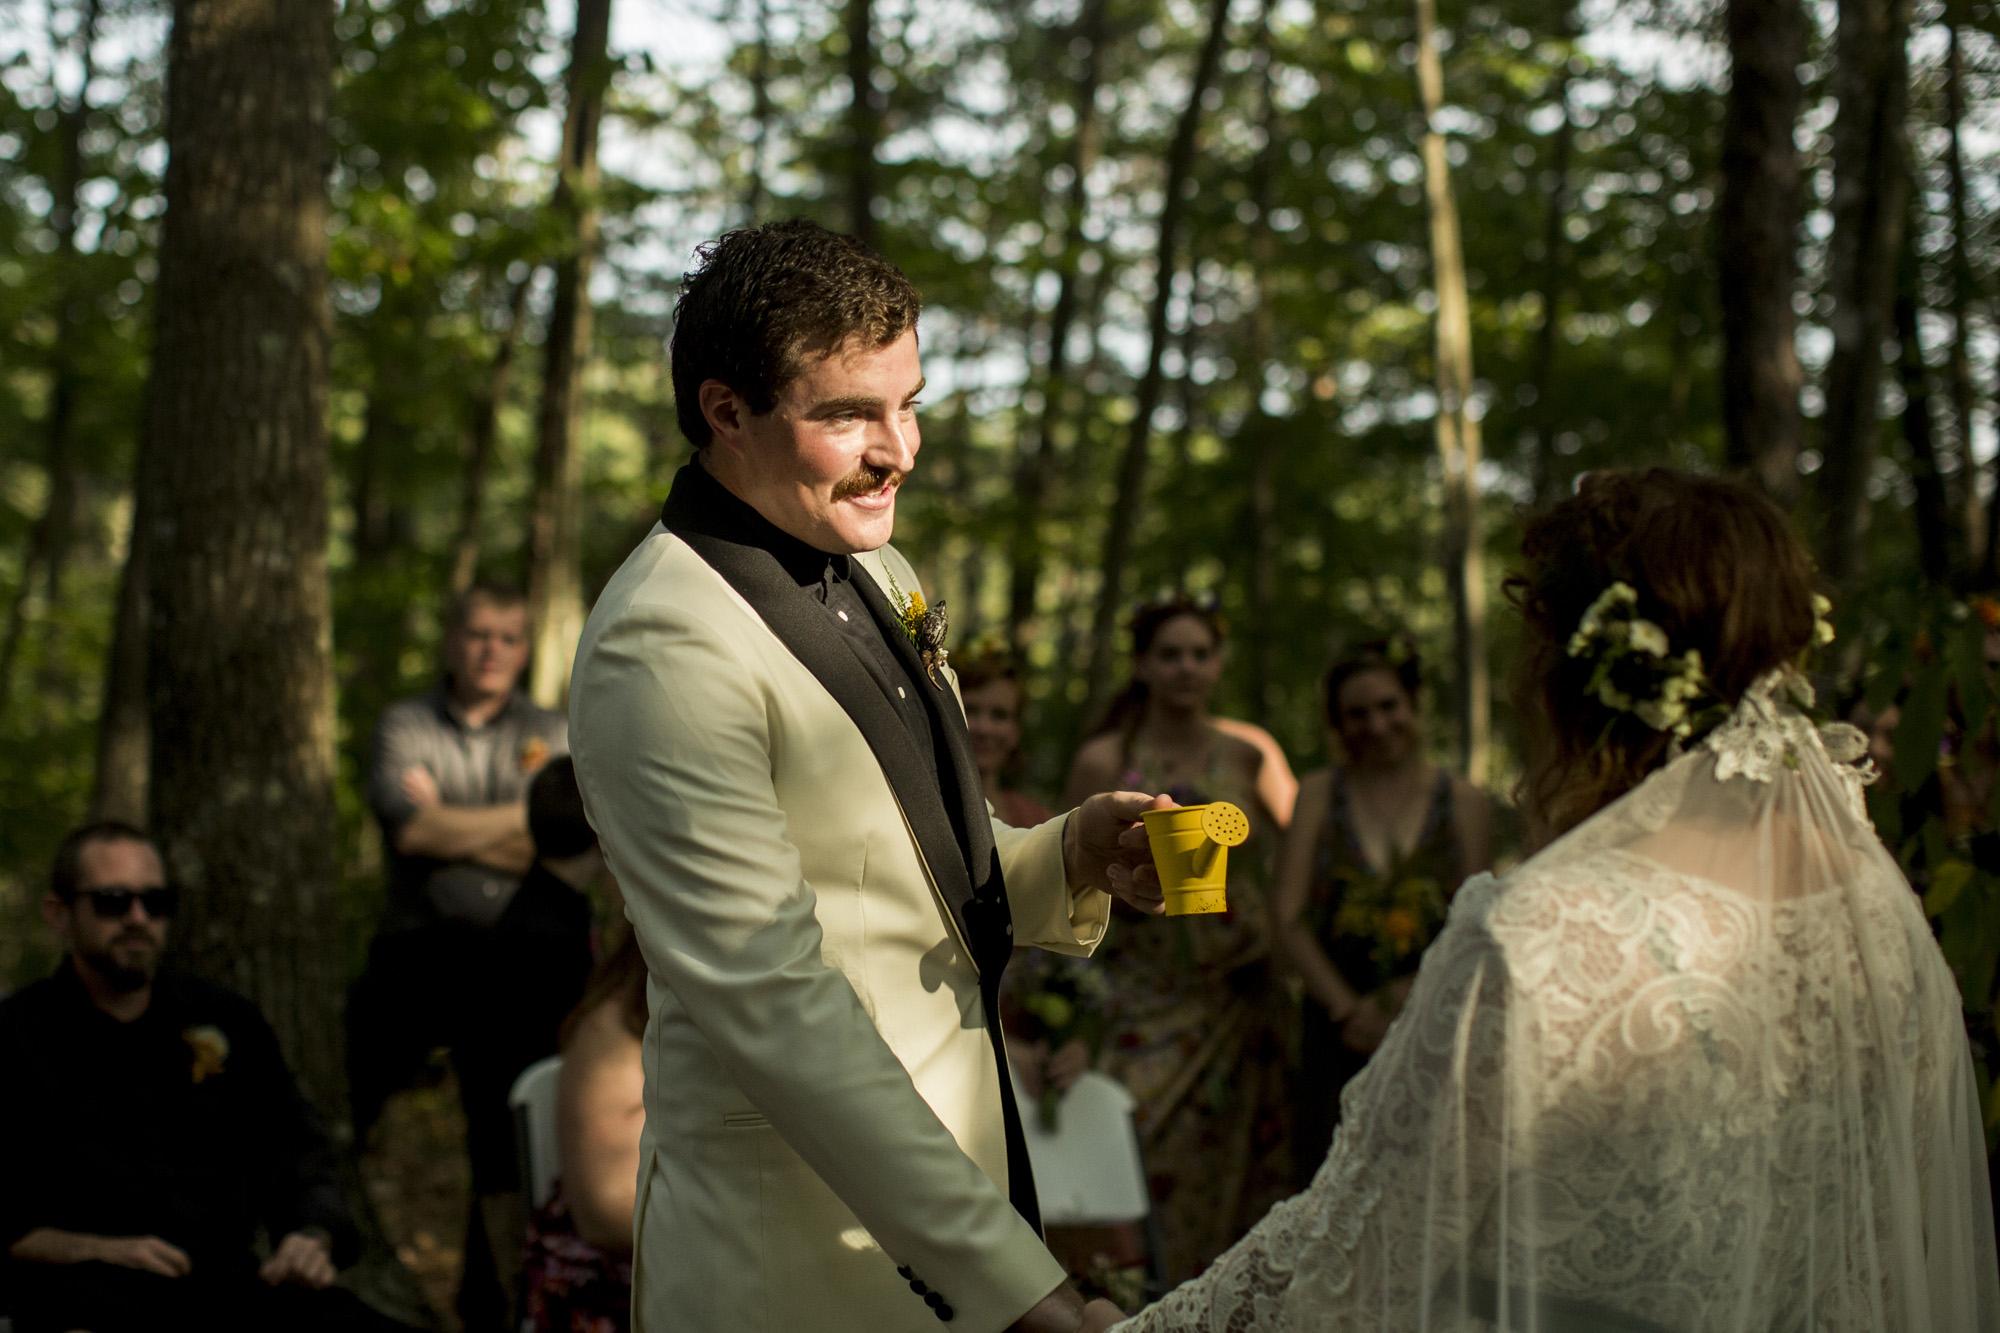 Seriously_Sabrina_Photography_Red_River_Gorge_Kentucky_Wedding_ShawnDana124.jpg